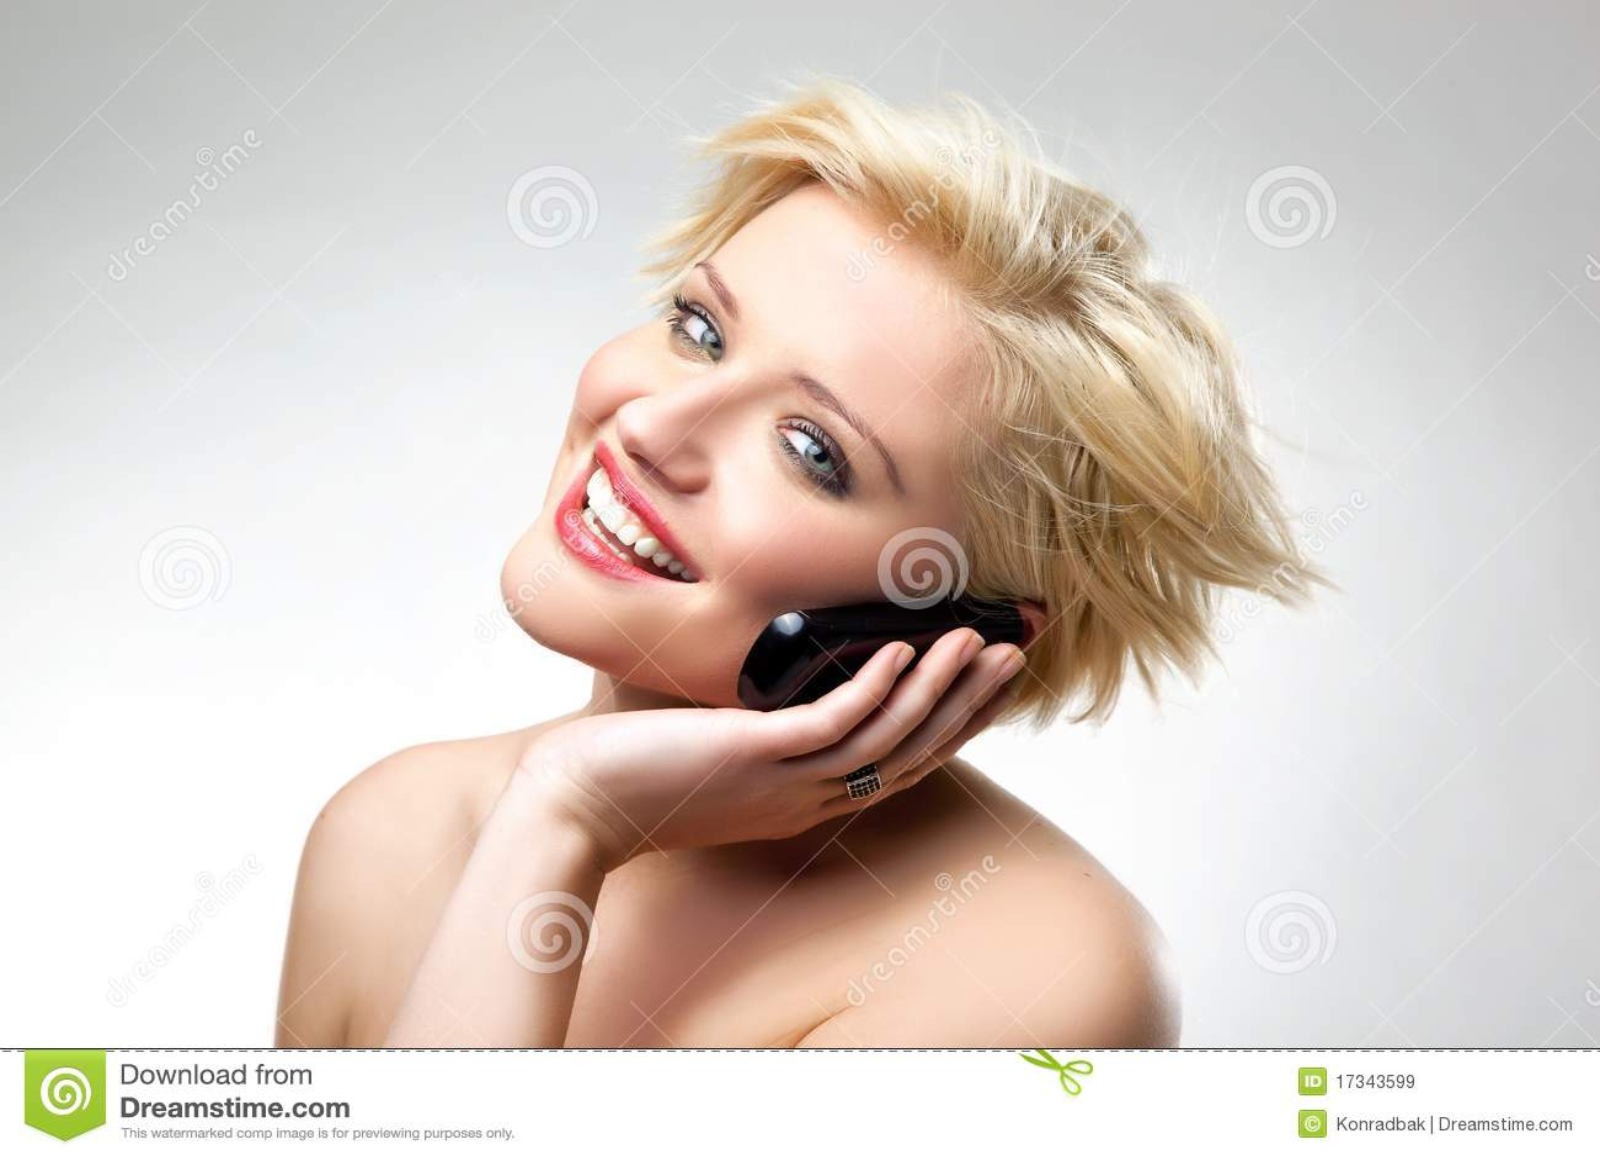 Сперма блондинки красотки фото лбу картинки